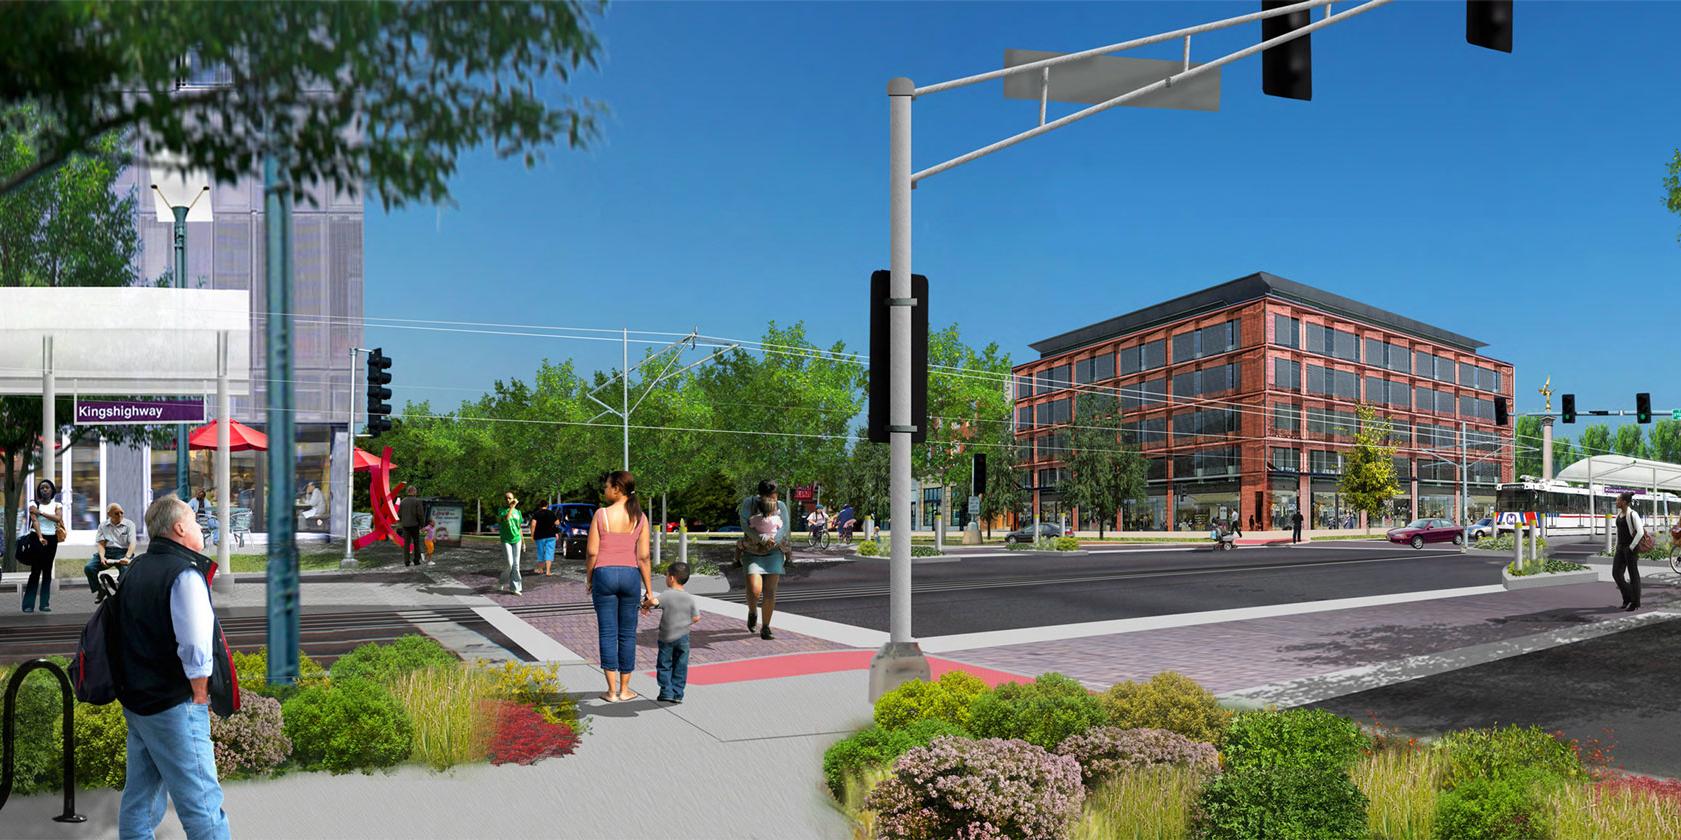 Northside/Southside MetroLink Expansion and Transforming Transit in St. Louis